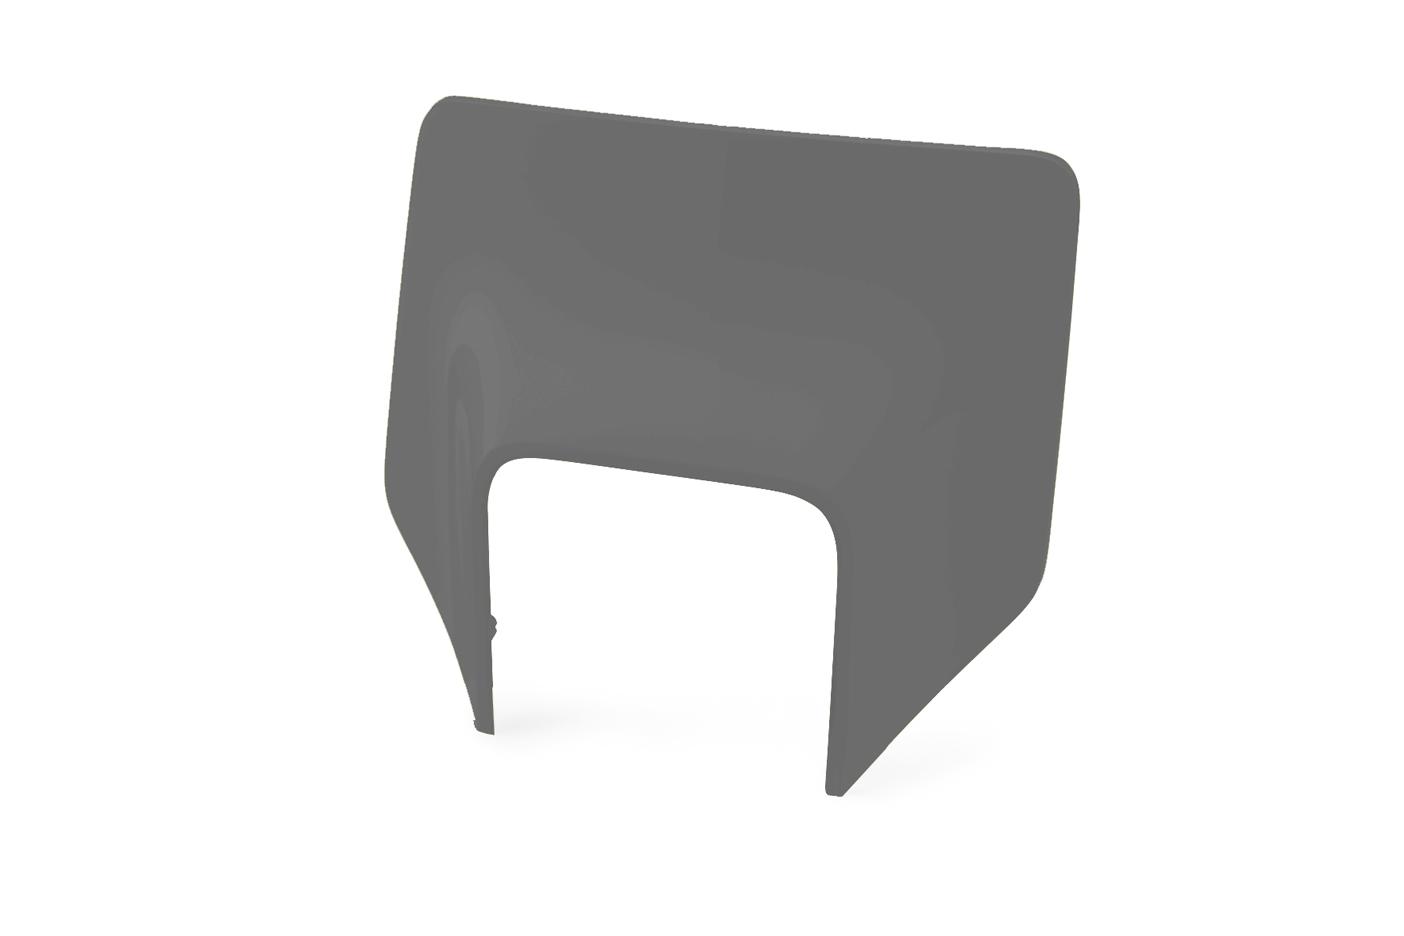 Lampenmaske für deine Husqvarna FE / TE in grau